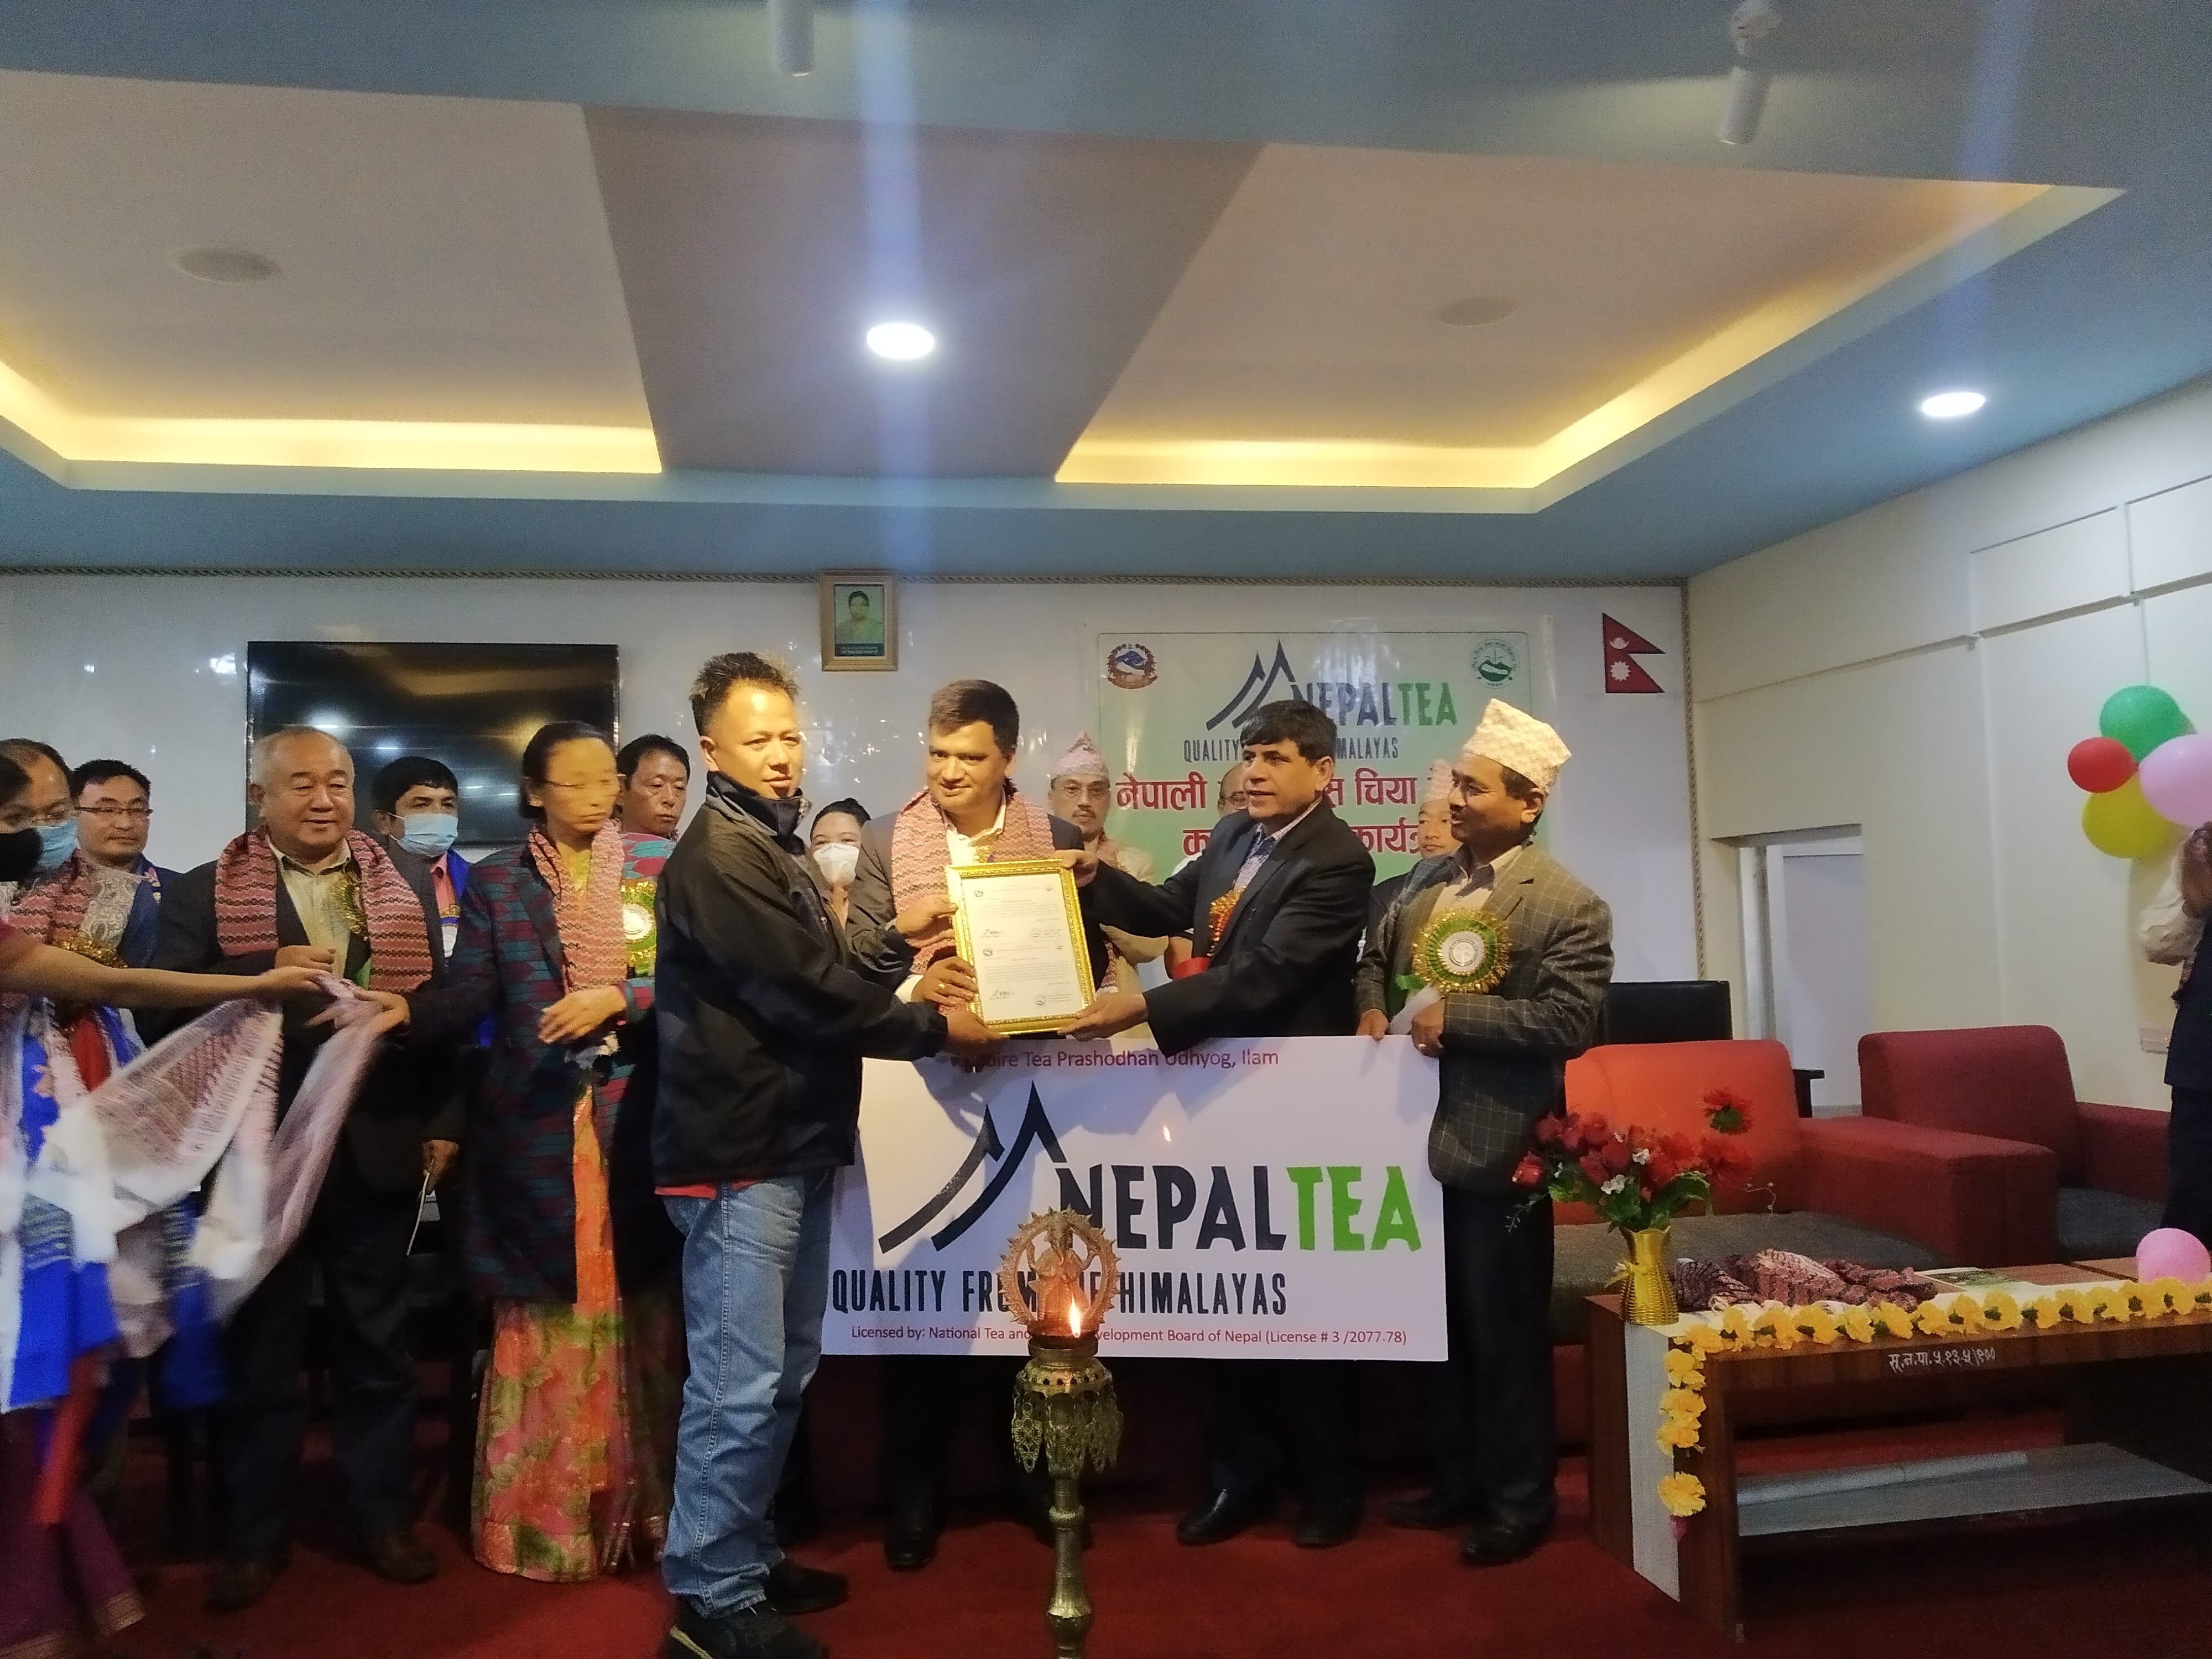 Nepal Tea Trademark Implementation Program